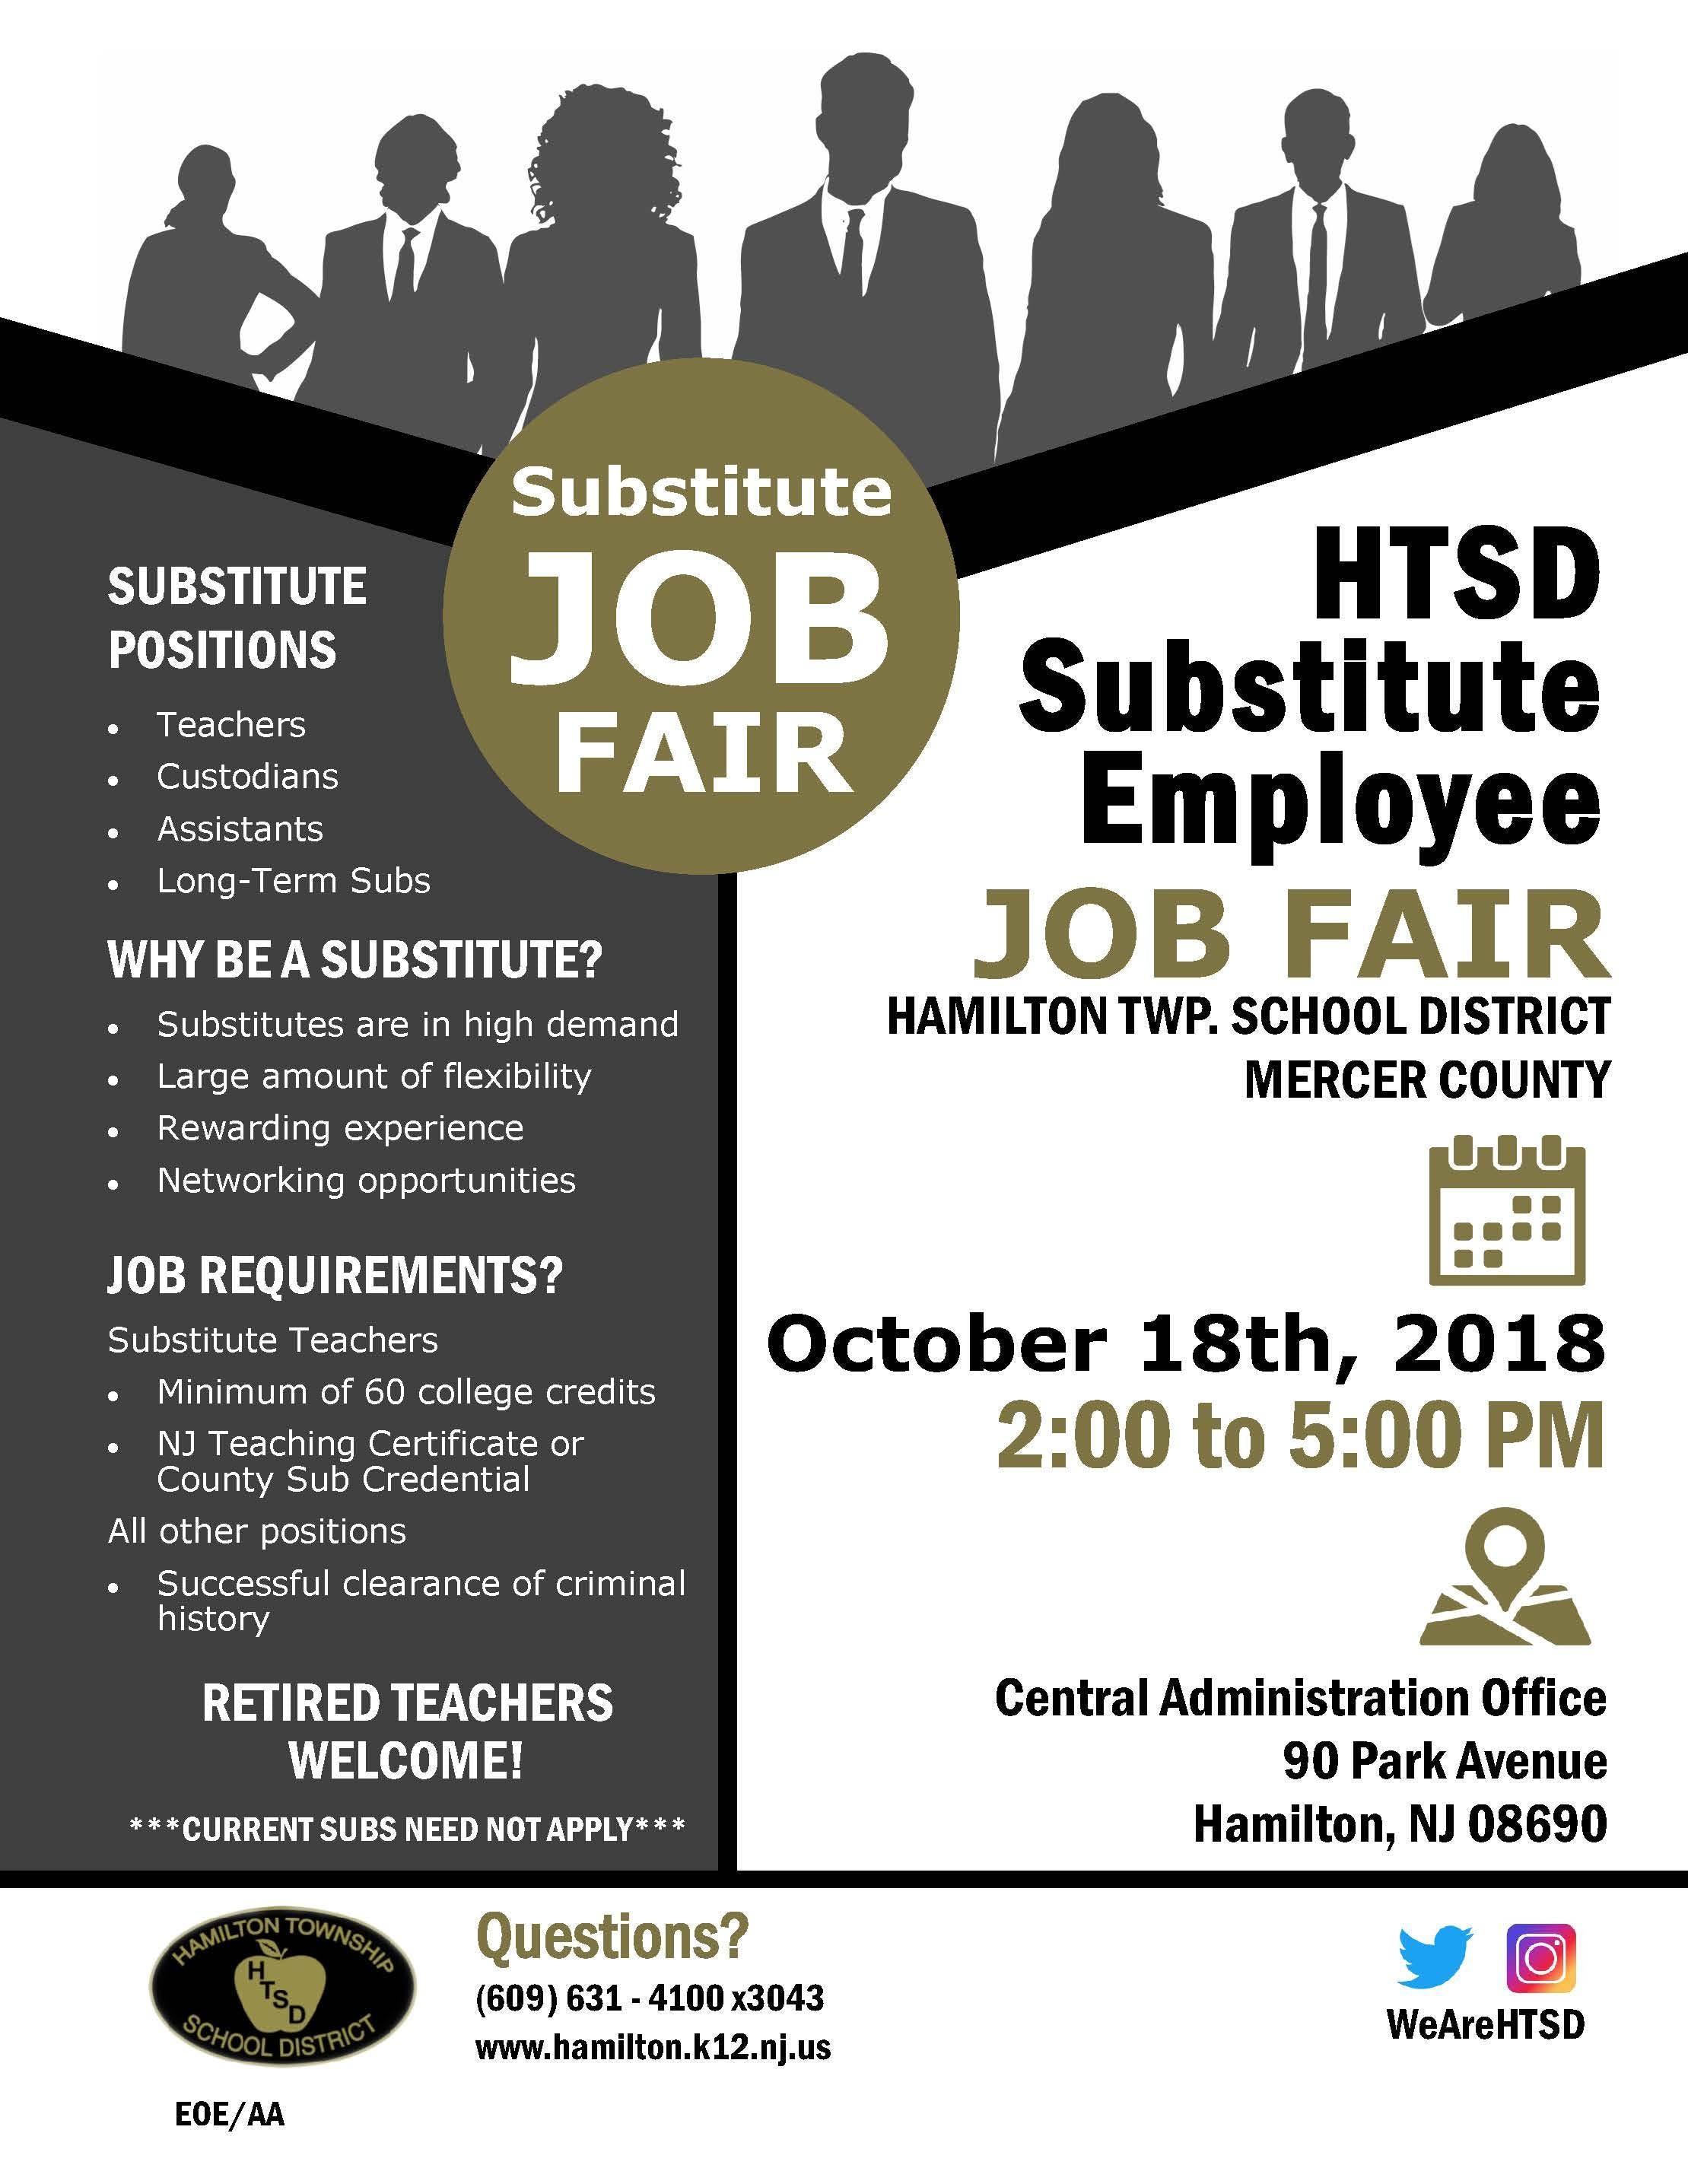 Insight At Htsd Substitute Employee Job Fair Hamilton Township